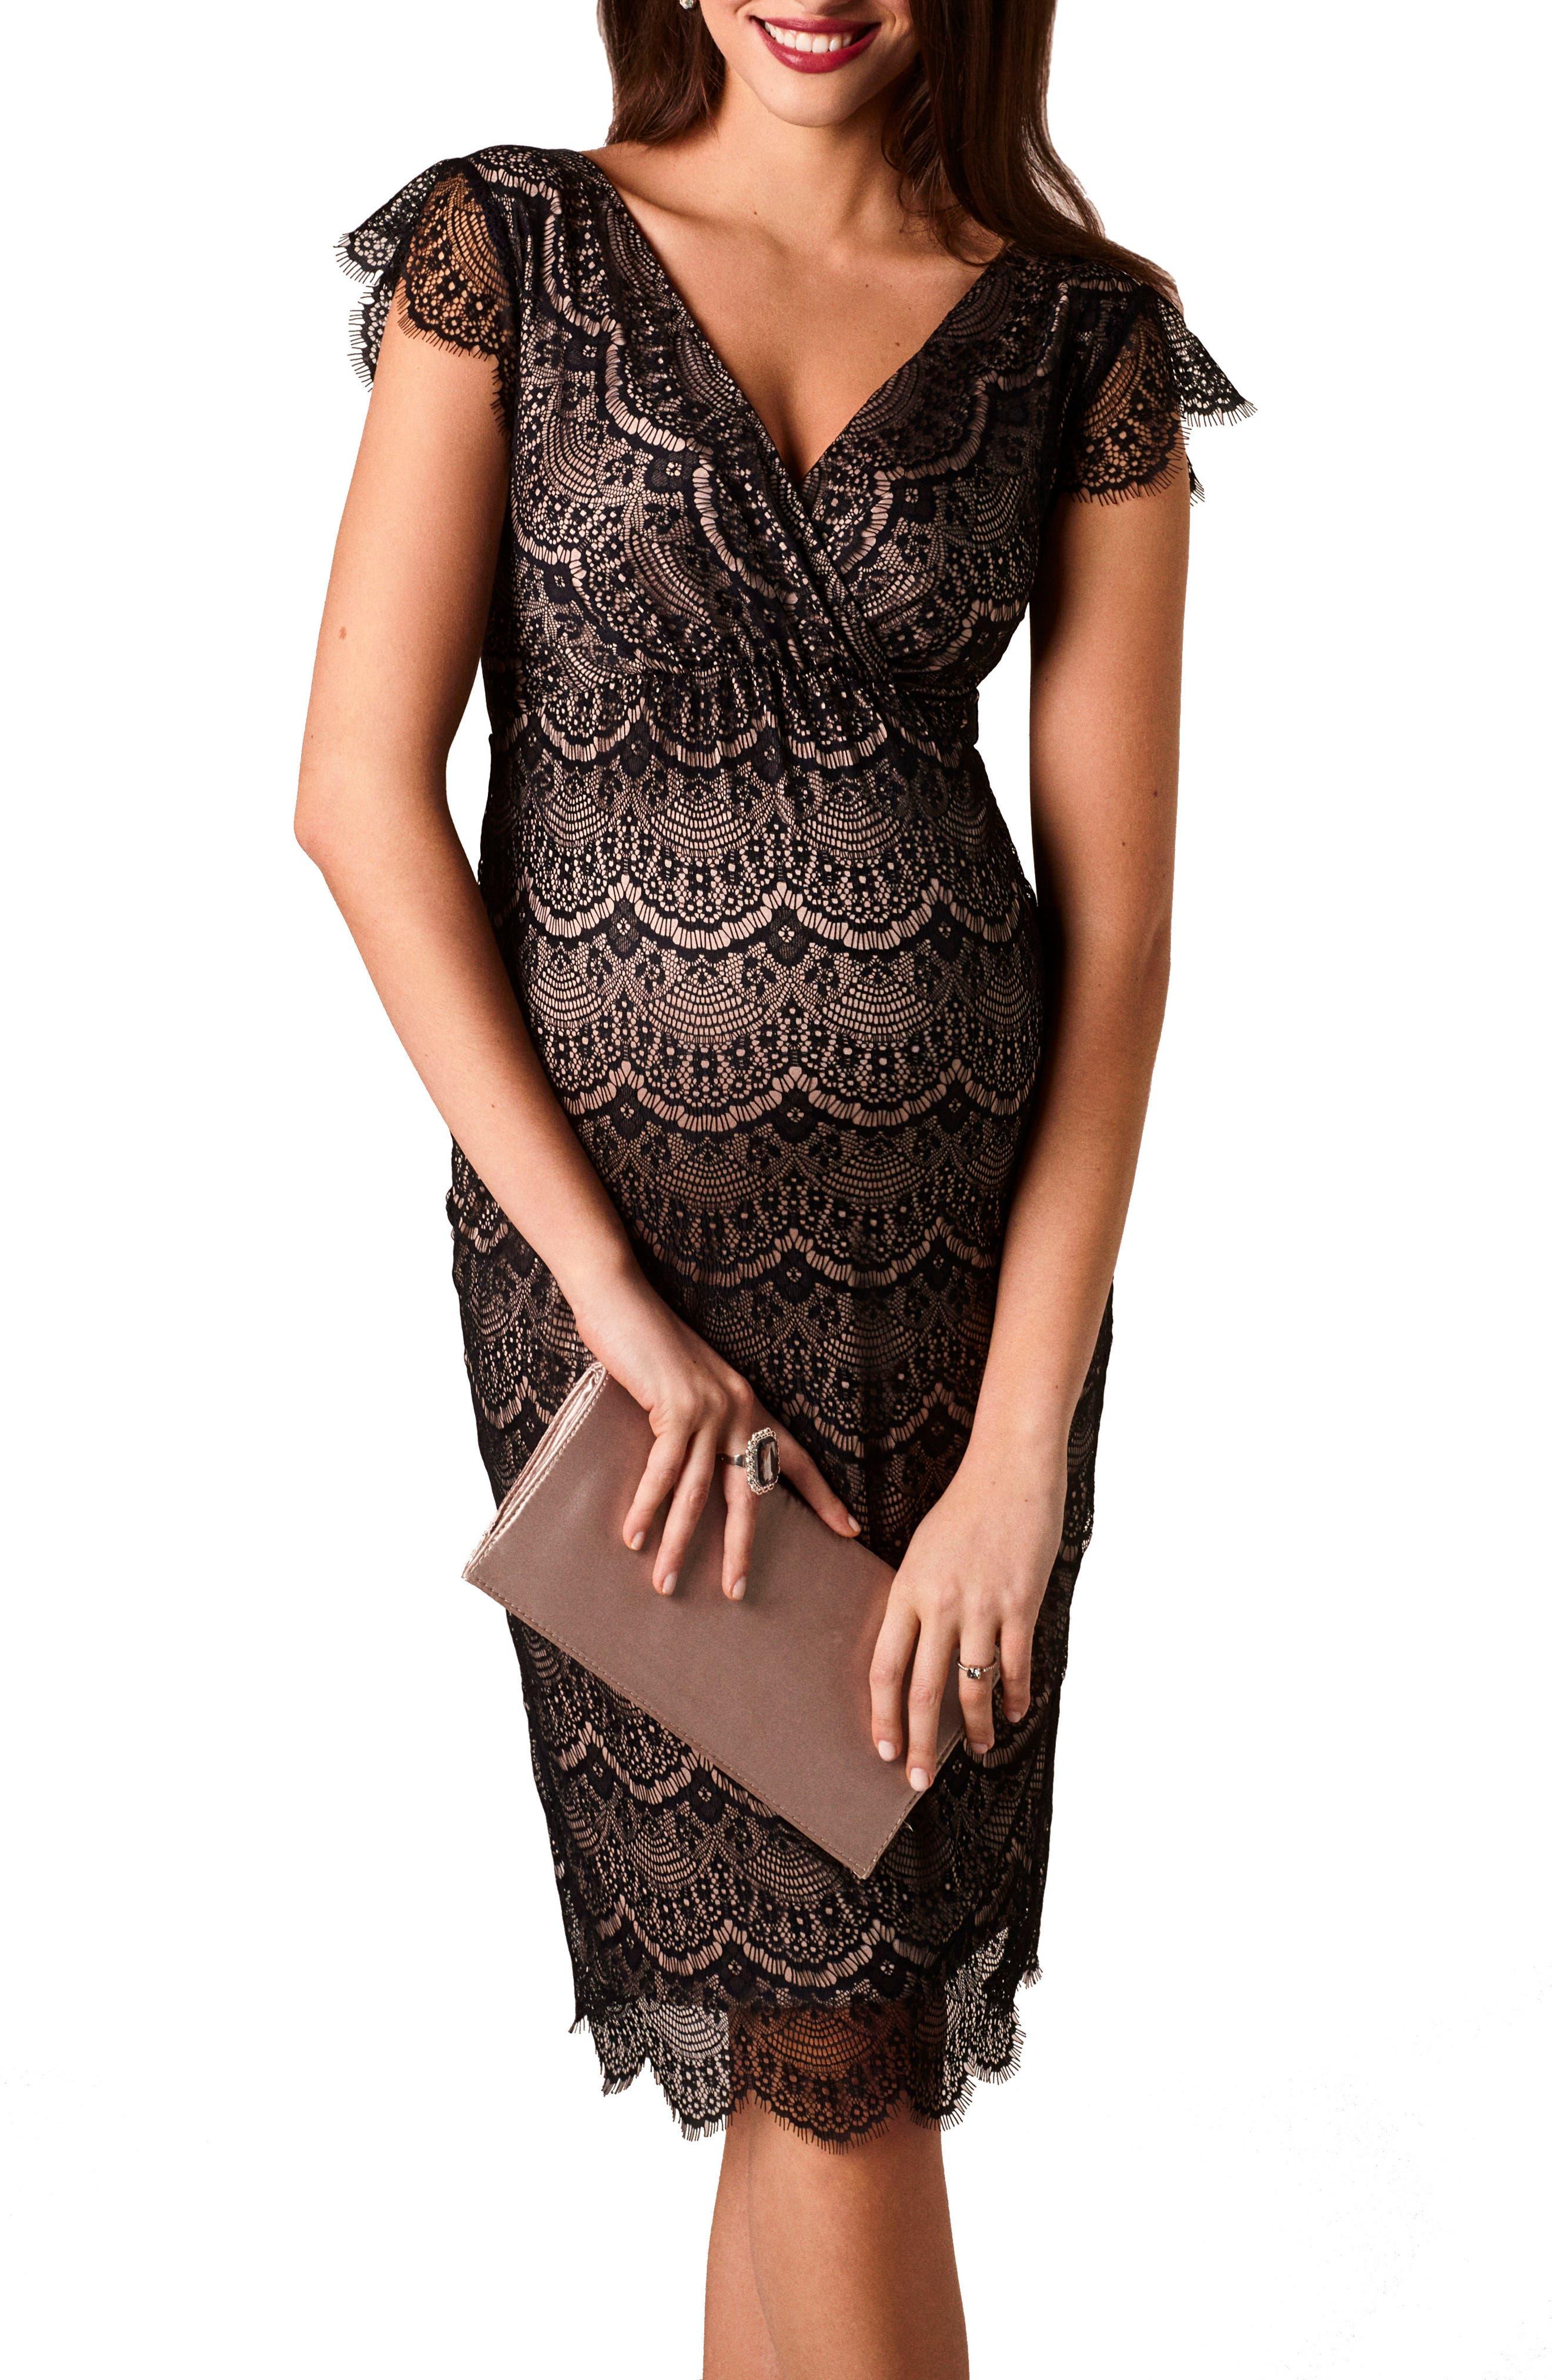 Tiffany Rose Imogen Maternity Dress, Black